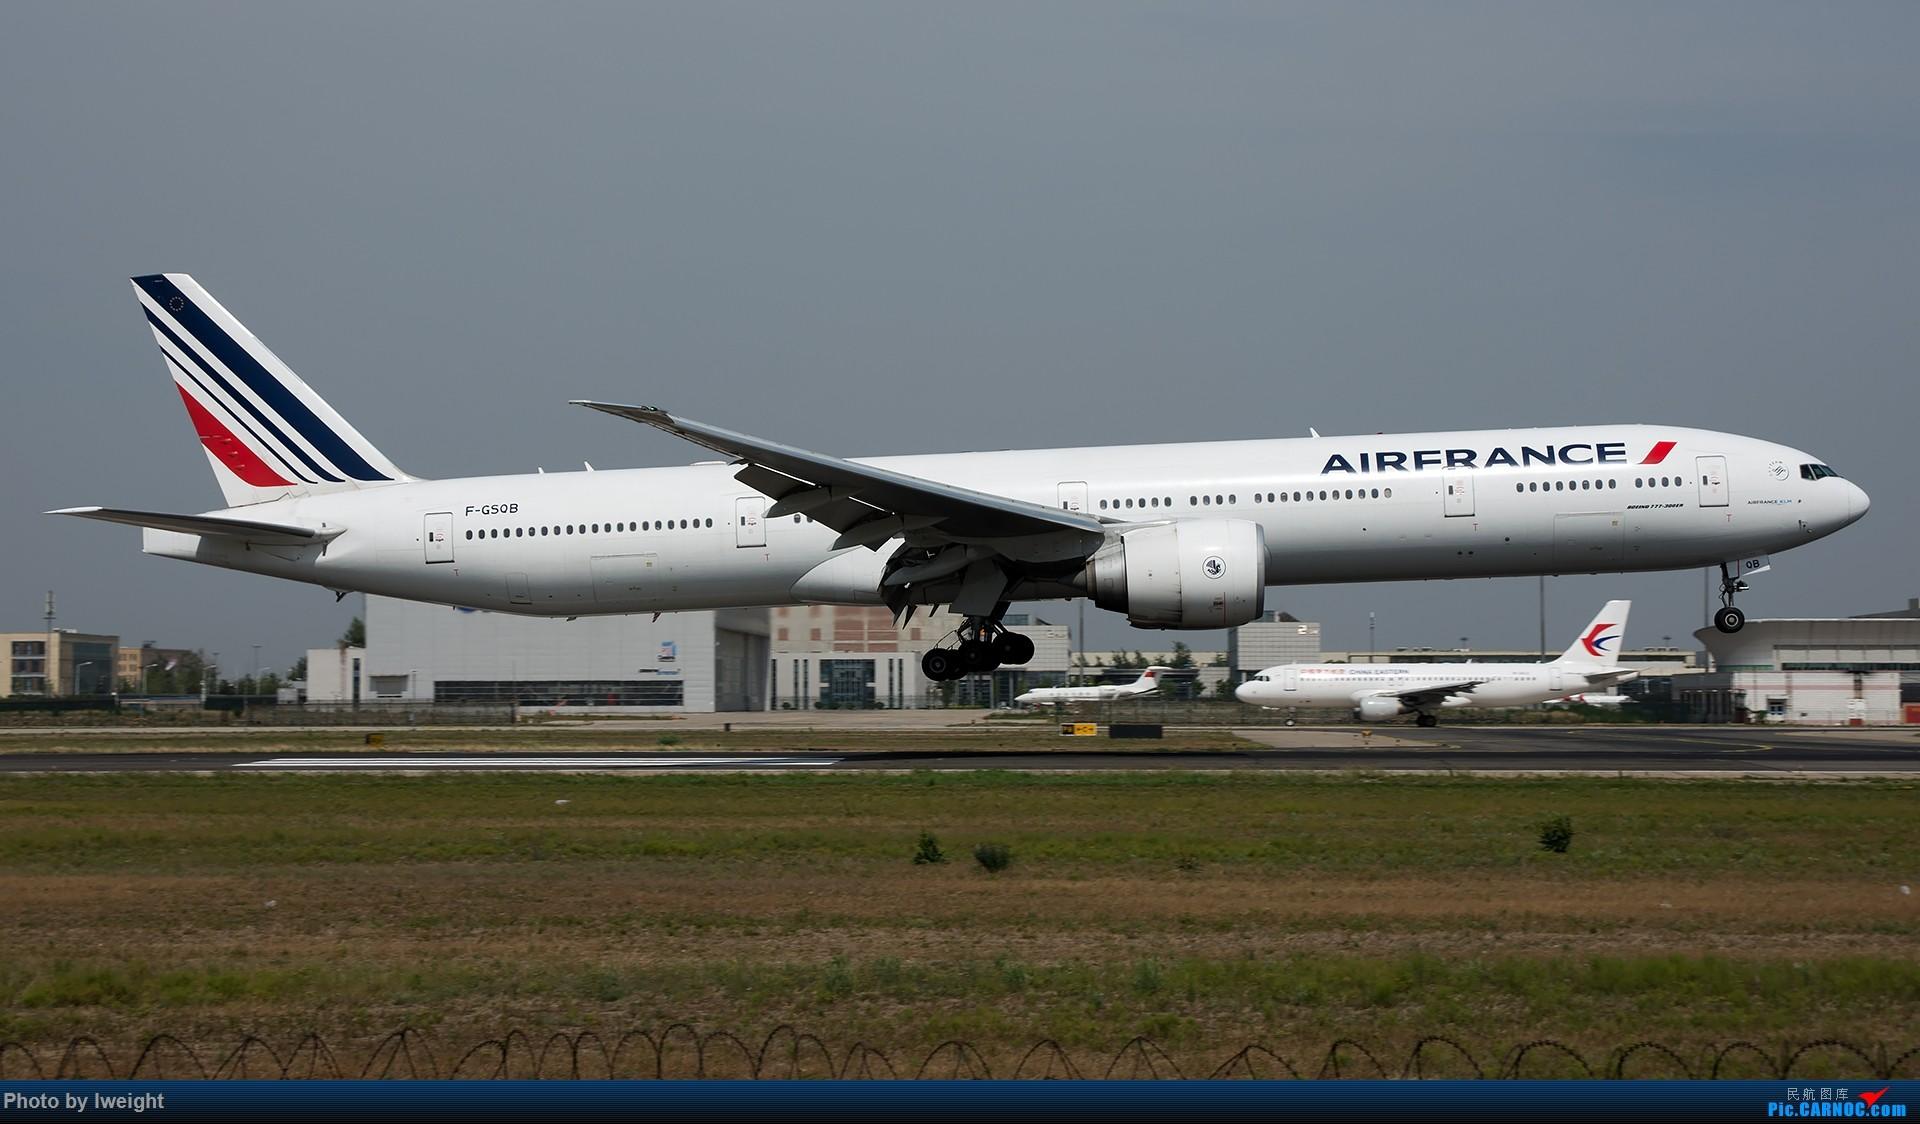 Re:[原创]很不错的天气,18R一组 BOEING 777-300ER F-GSQB 中国北京首都国际机场